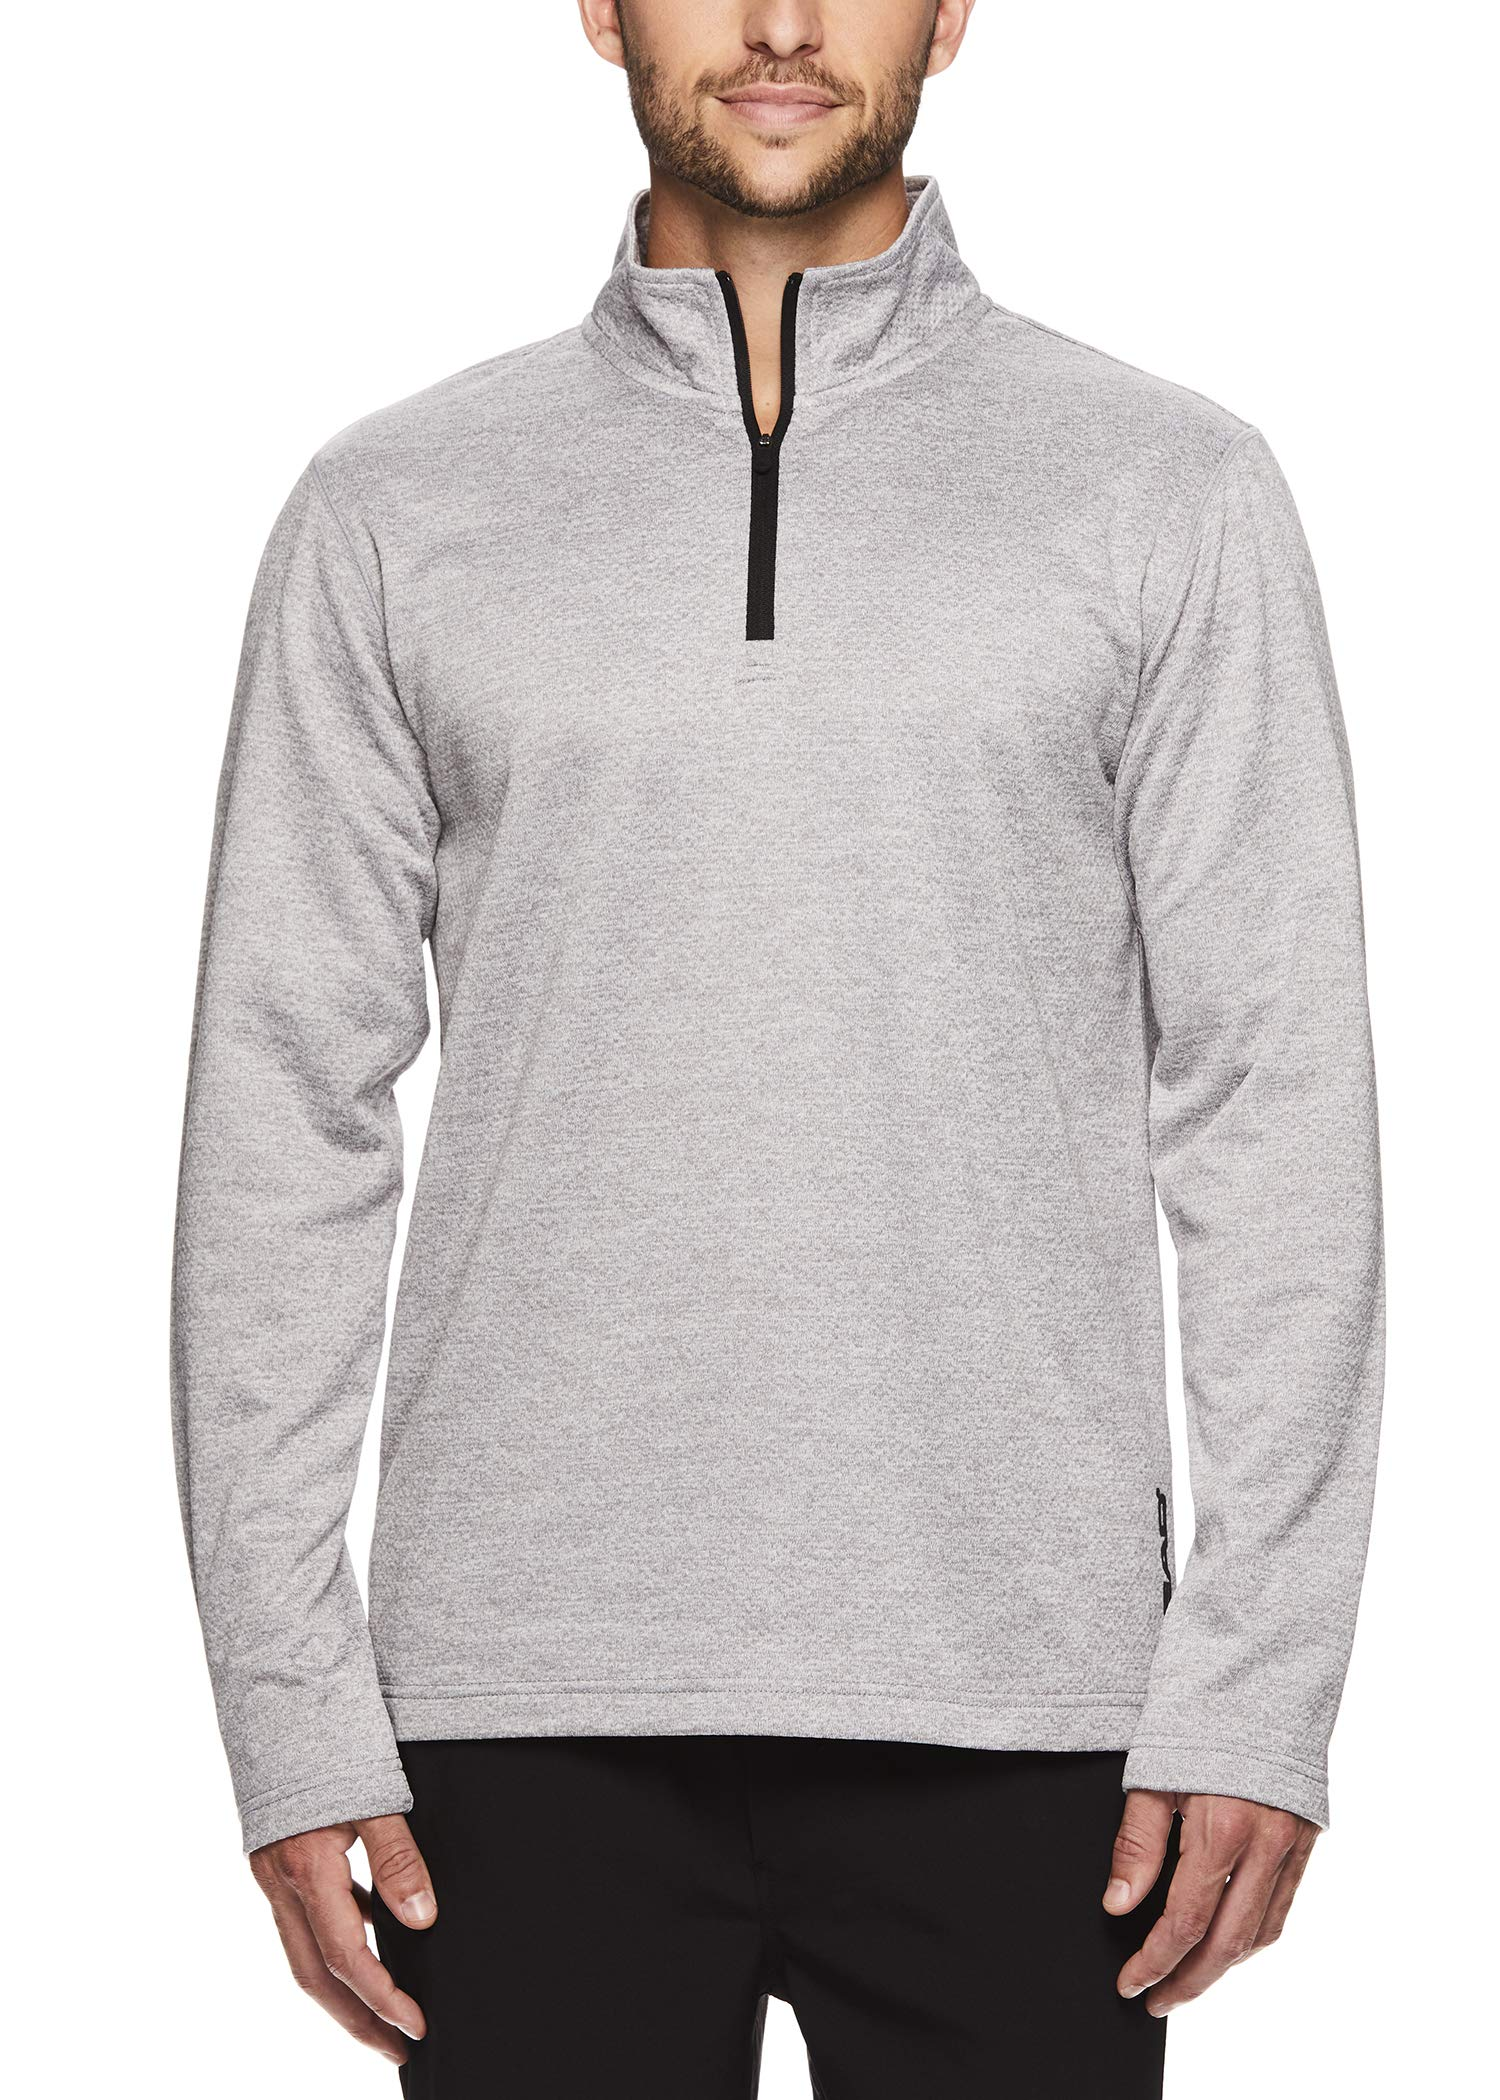 HEAD Men's 1/4 Zip Up Activewear Pullover Jacket - Long Sleeve Running & Workout Sweater - Showtime Sleet Heather, Small